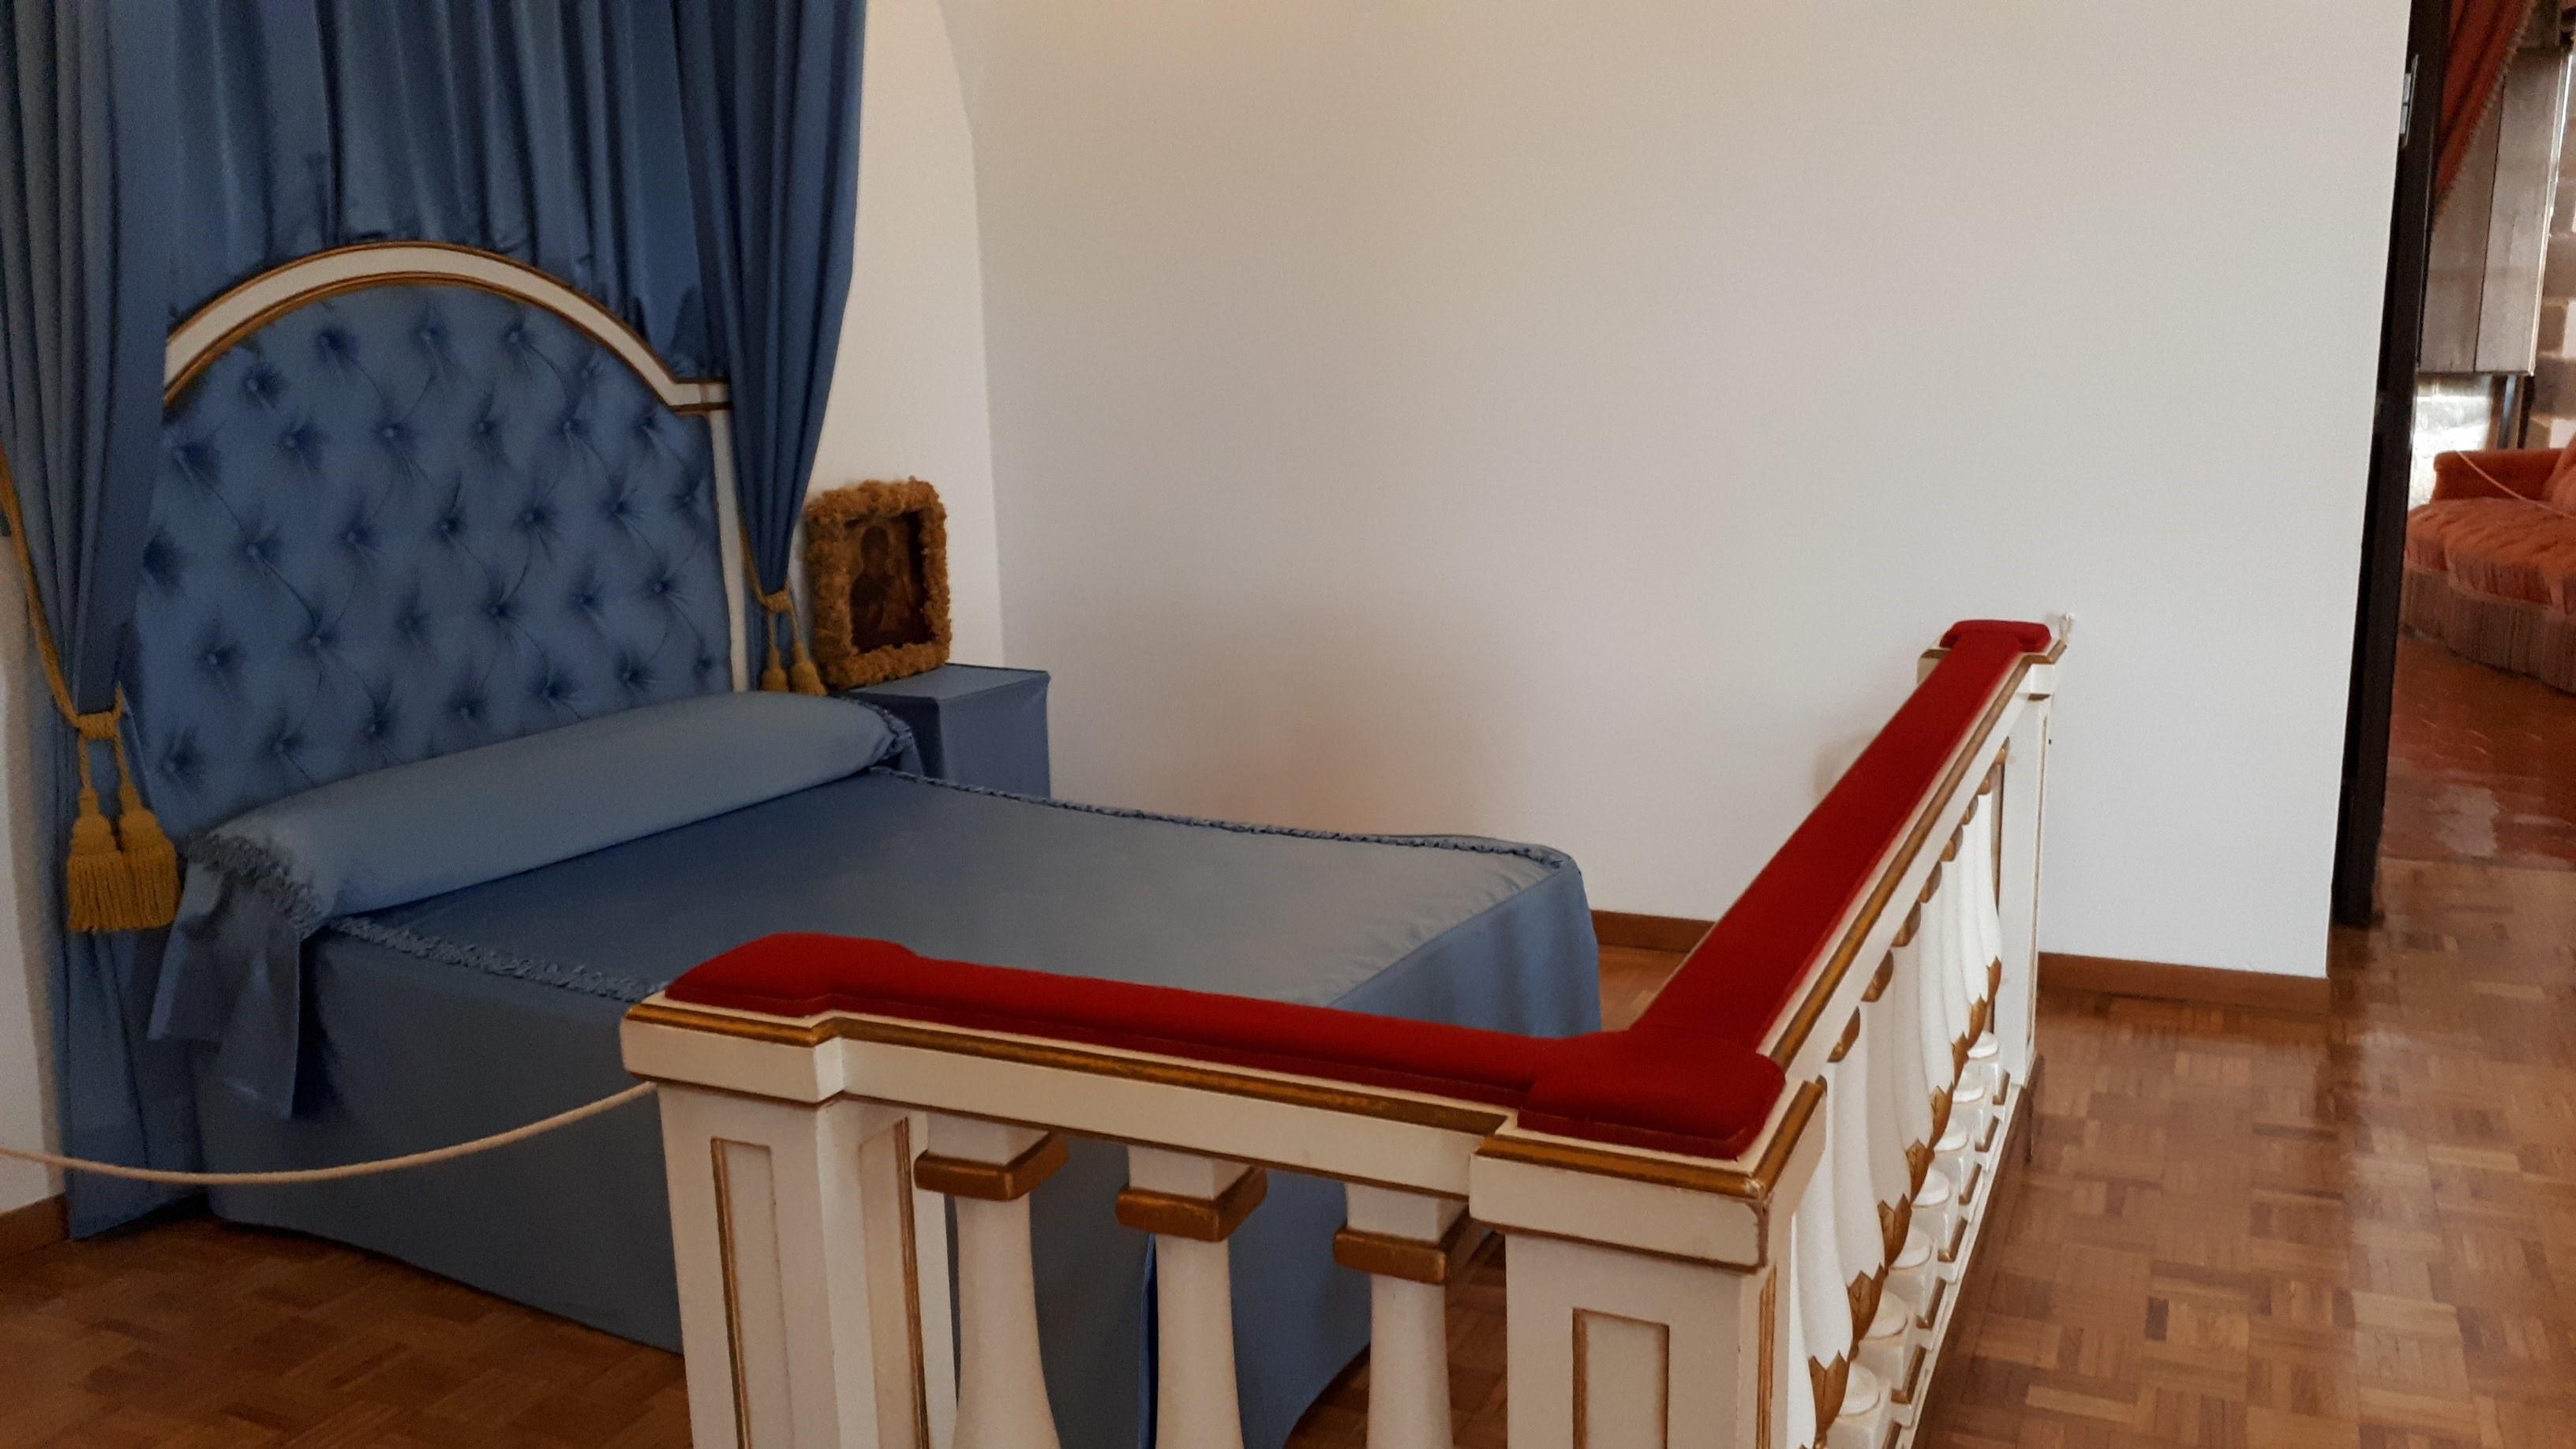 Bedroom of Gala